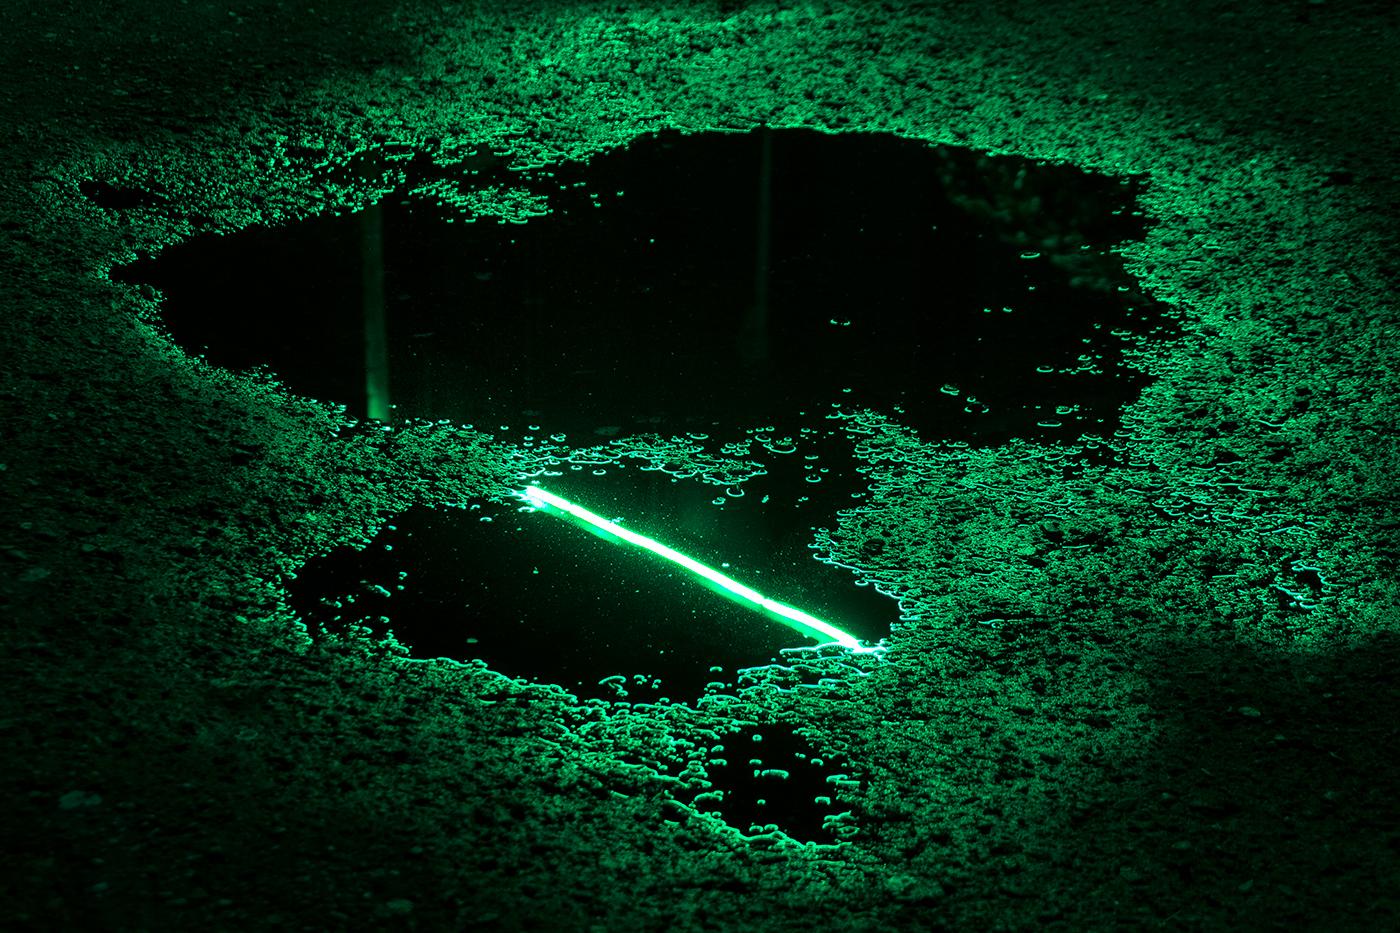 wet-neon-local-preacher-photography-13.jpg